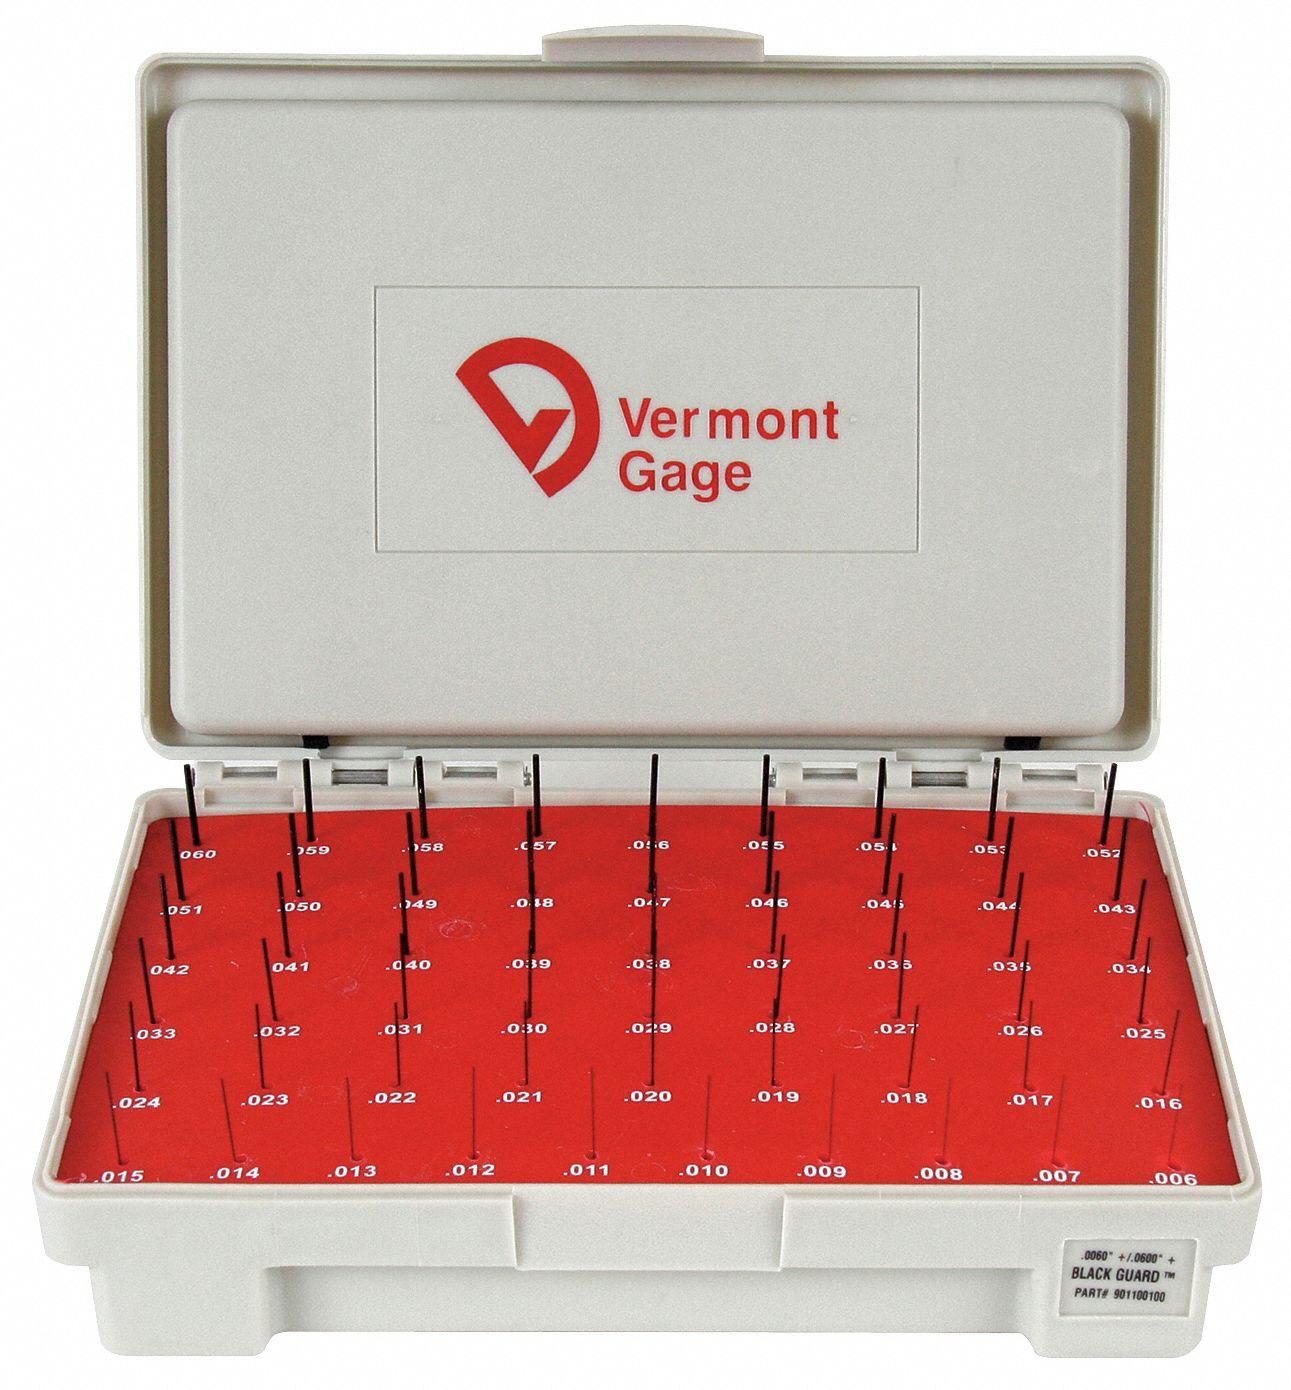 Vermont Gage 911100400 Steel Go Plug Gage Black Oxide 0.004 Gage Diameter Tolerance Class ZZ